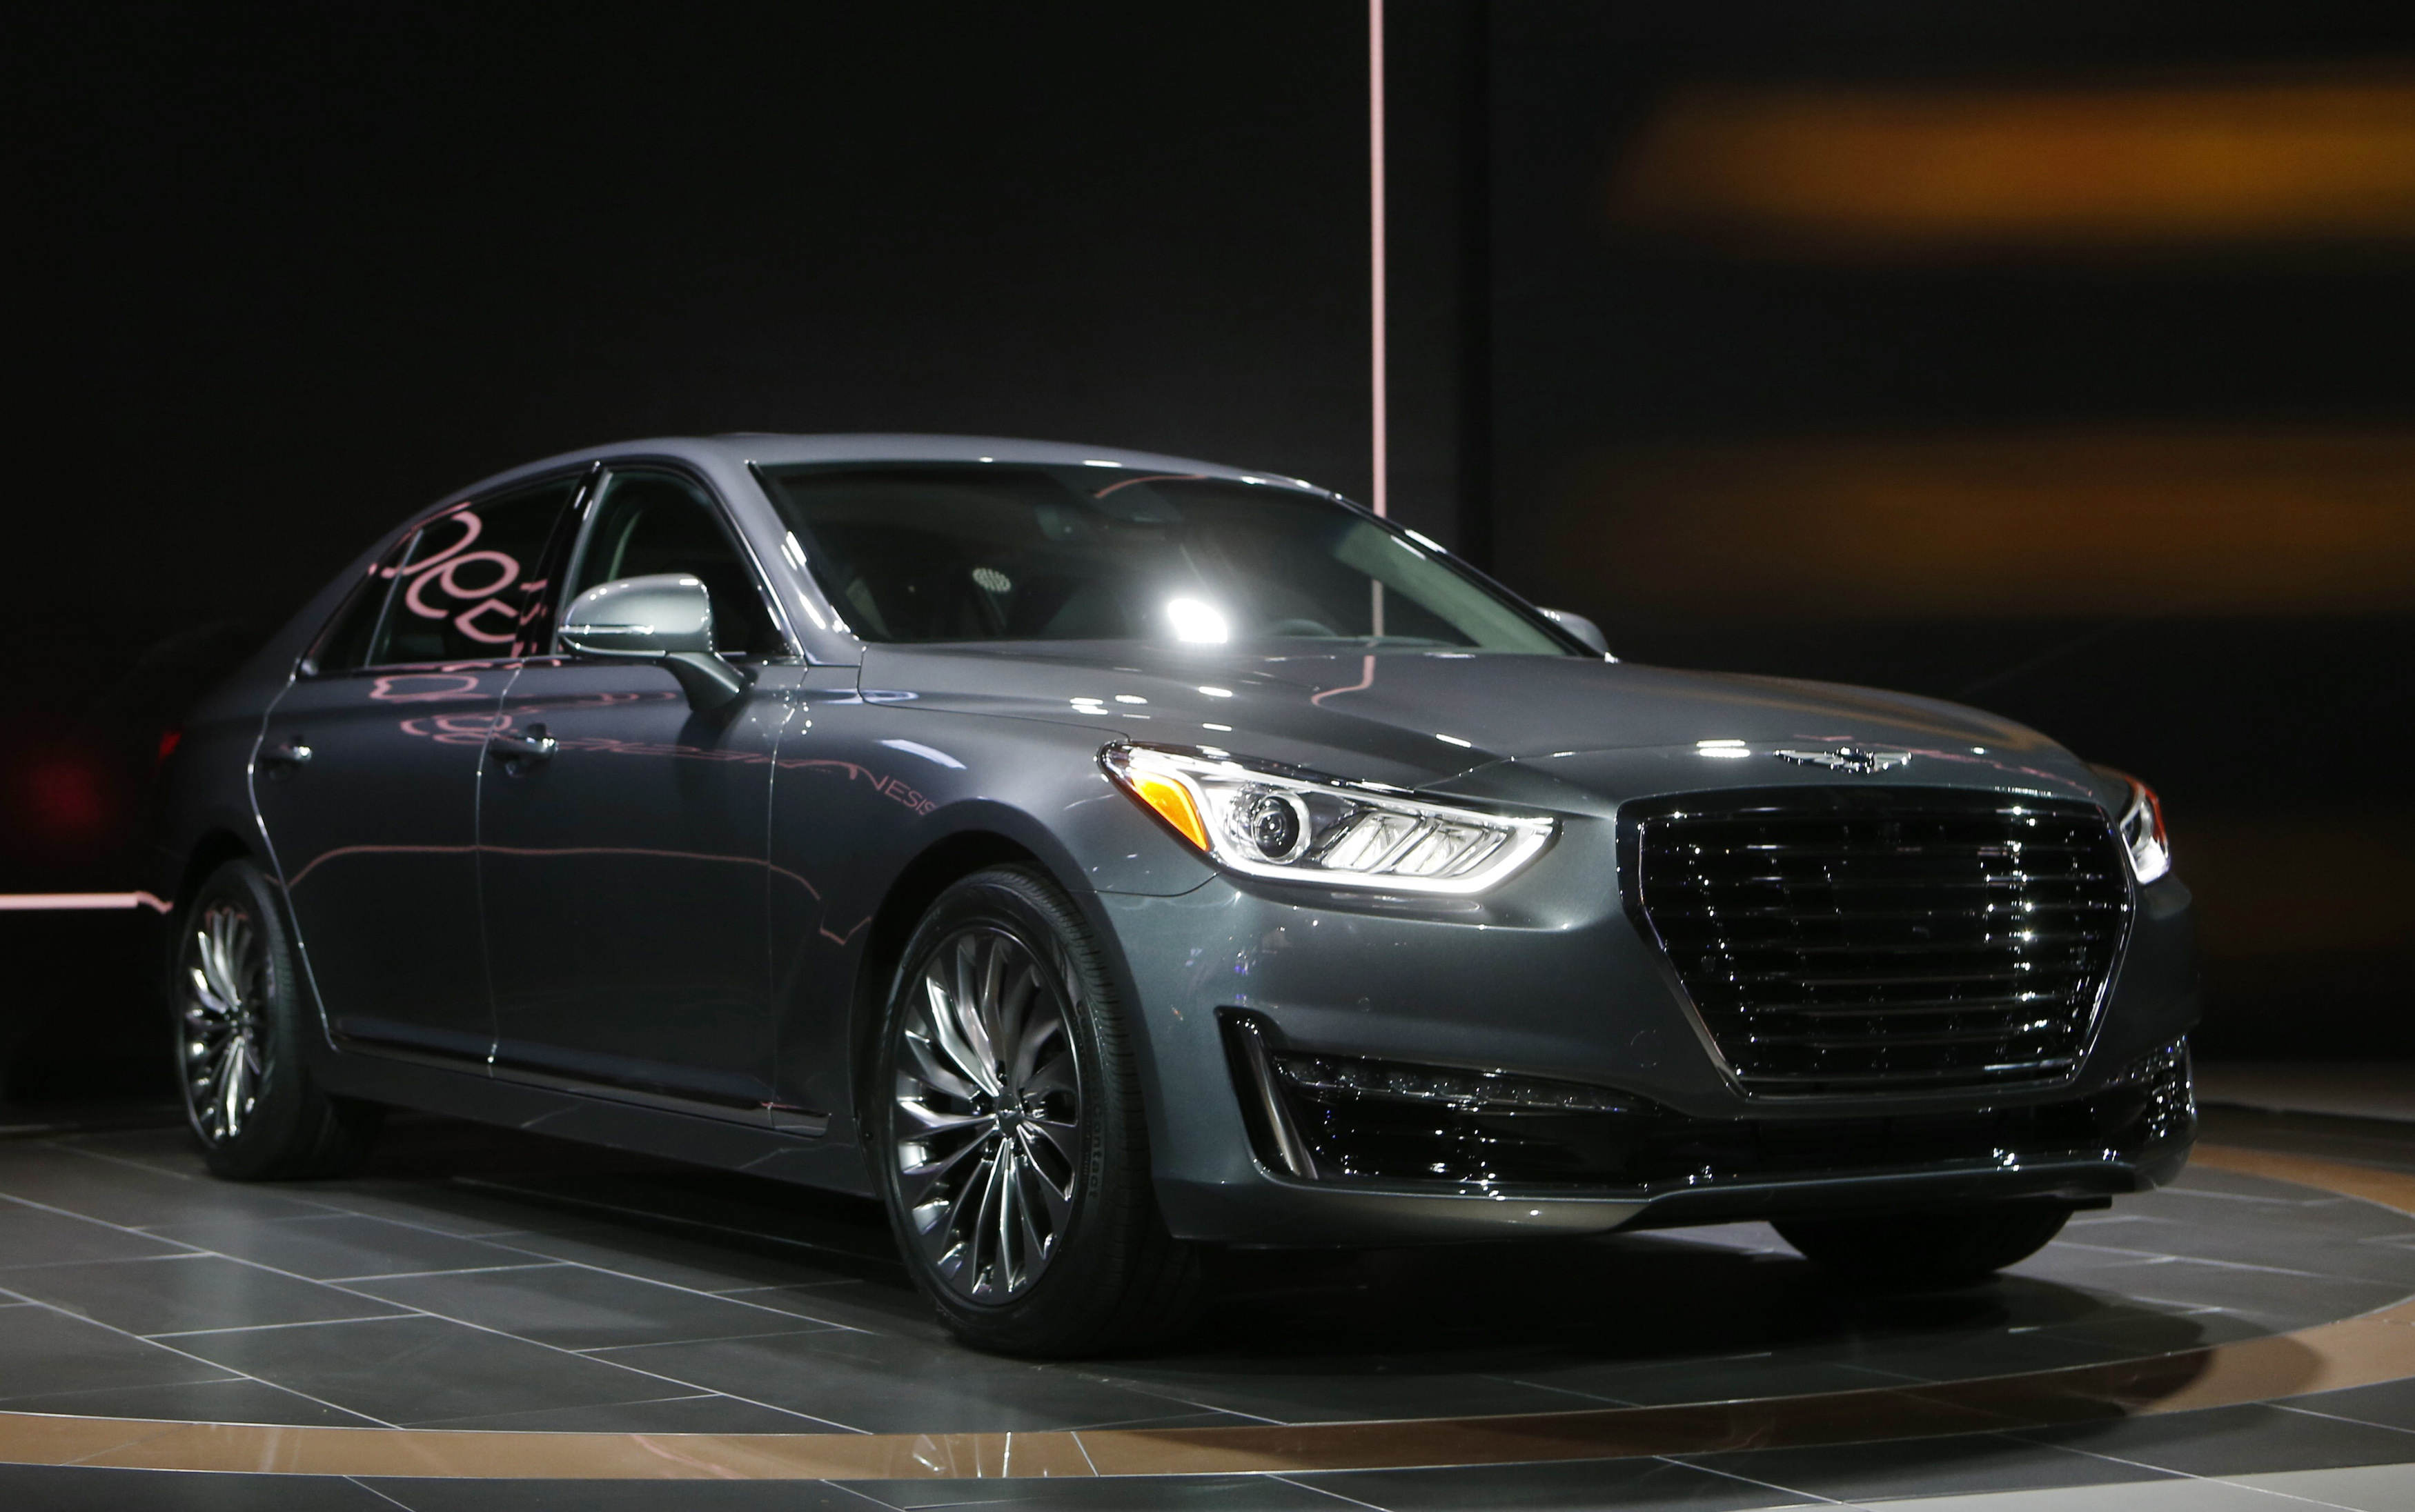 Detroit Auto Show 2016: Luxury Cars Make A Comeback